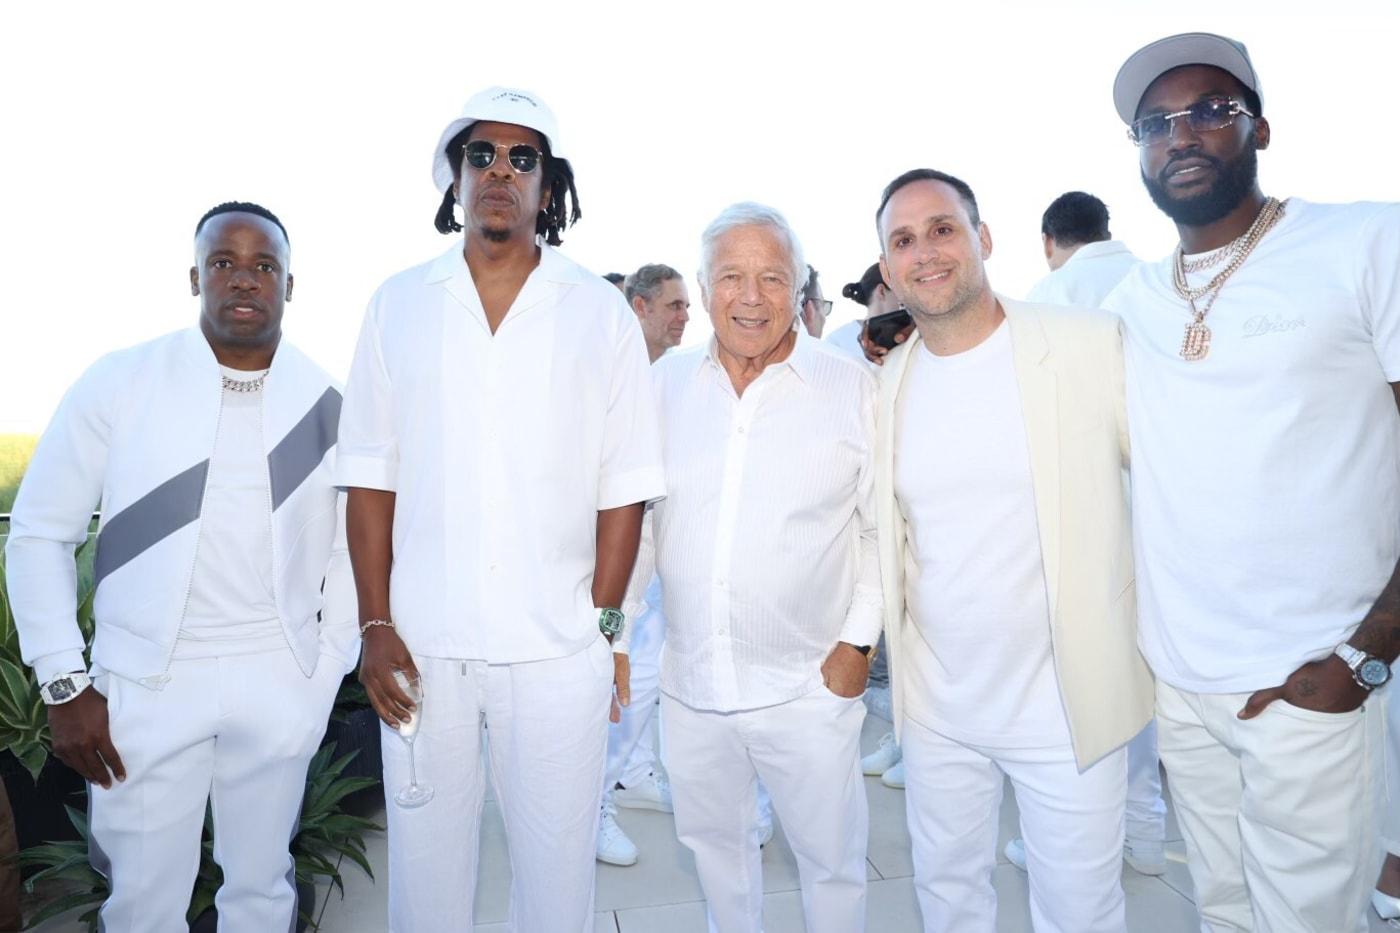 Yo Gotti, Jay-Z, Robert Kraft, Michael Rubin and Meek Mill